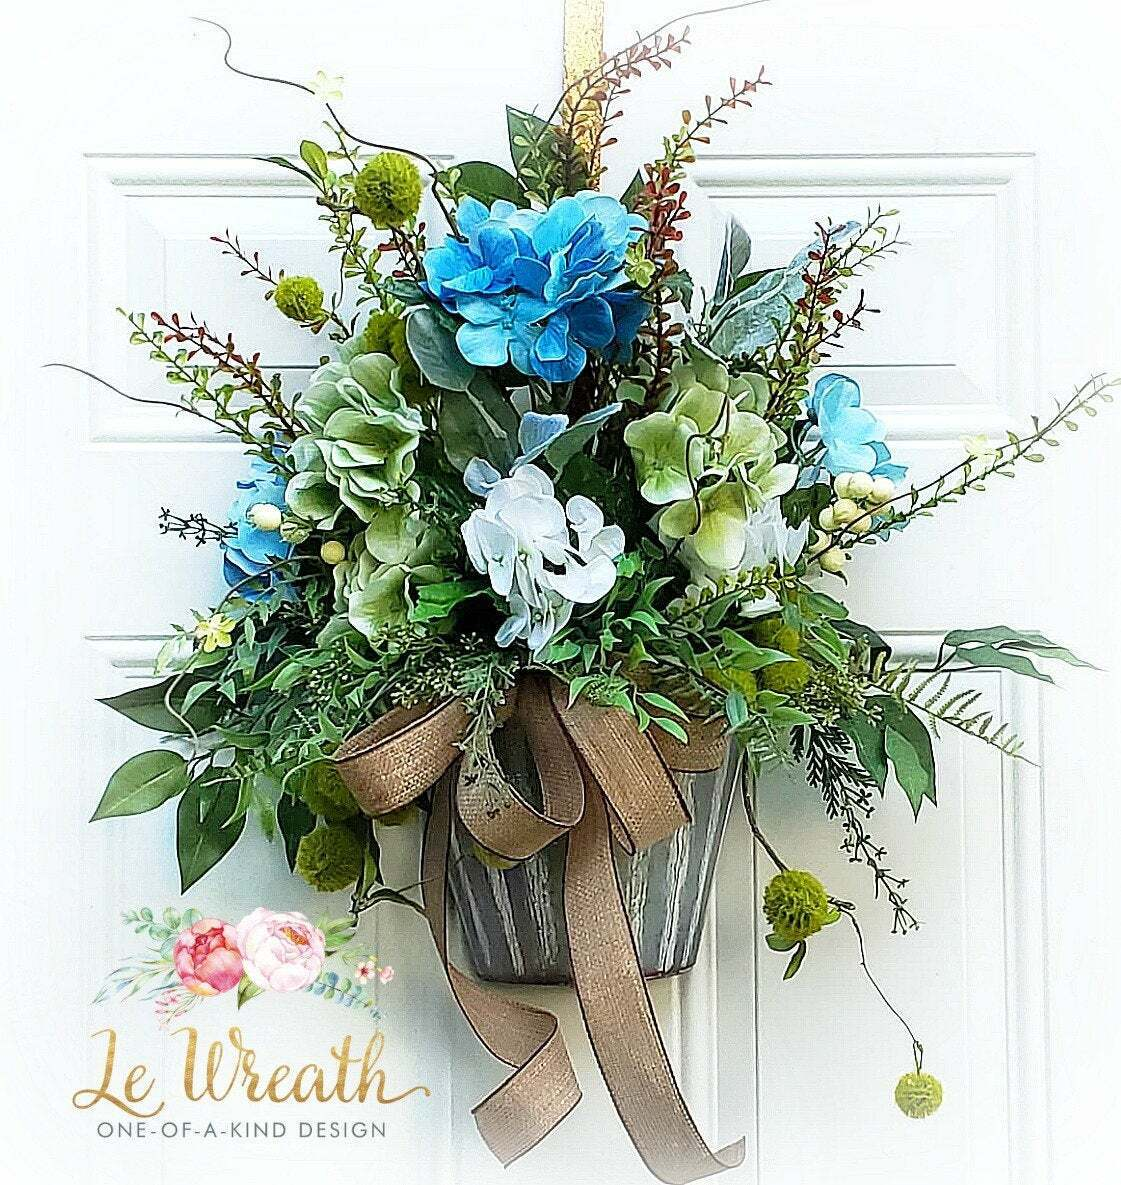 Farmhouse Hydrangea Floral Wall Decor Door Wreath Hanger Blau Weiß Home NEW